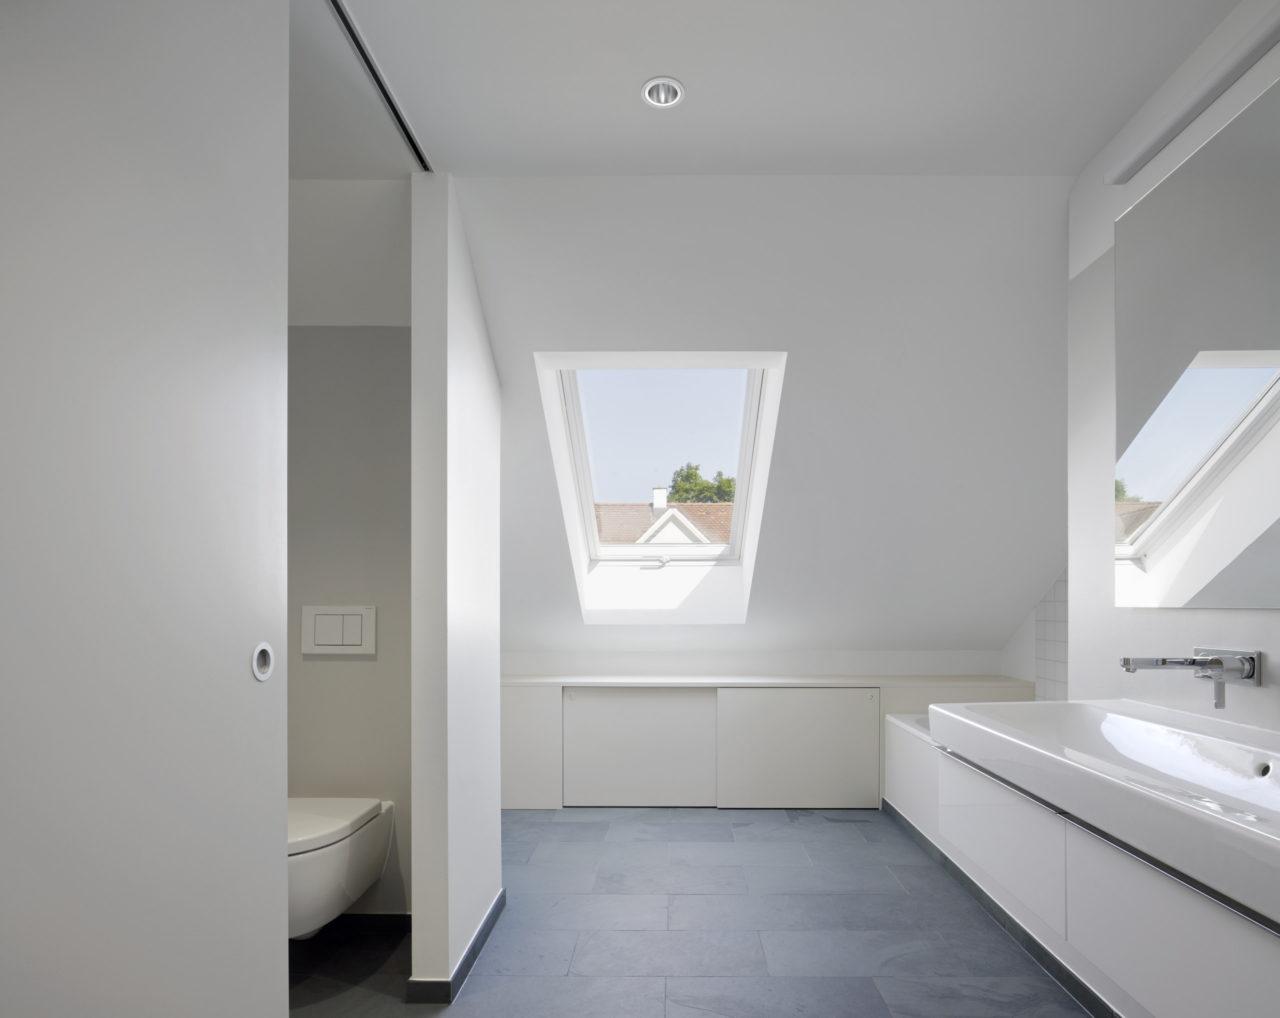 Bad im Dachgeschoss nach Umbau / Dachausbau von Architekturbüro Forsberg in Basel